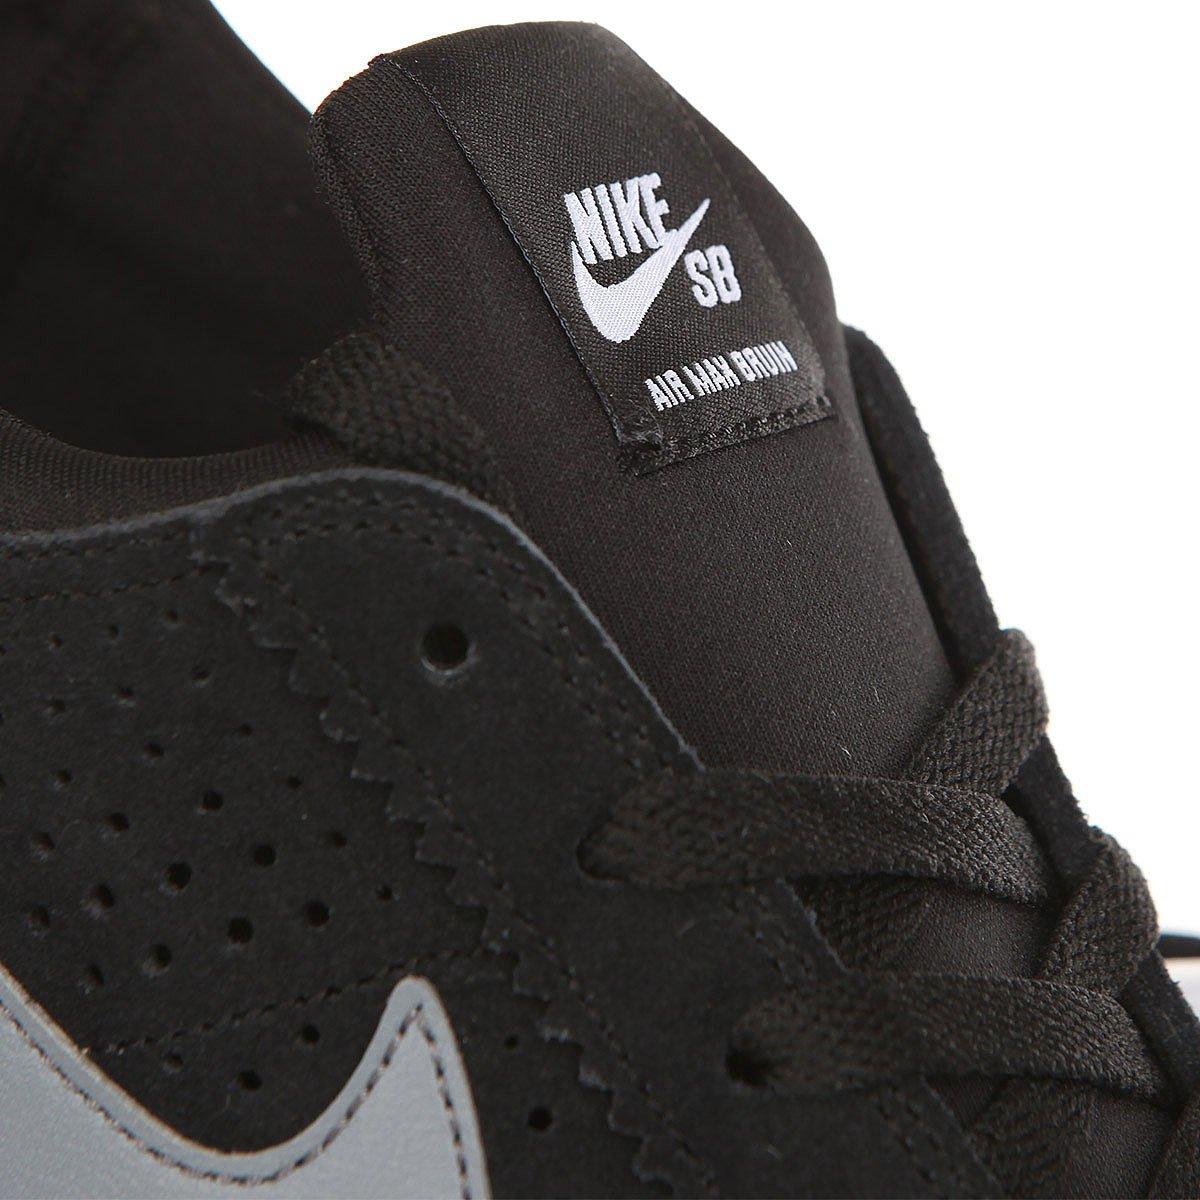 9b324dd2 Купить кроссовки Nike SB Bruin Max Vapor Black/Cool Grey (882097-001 ...